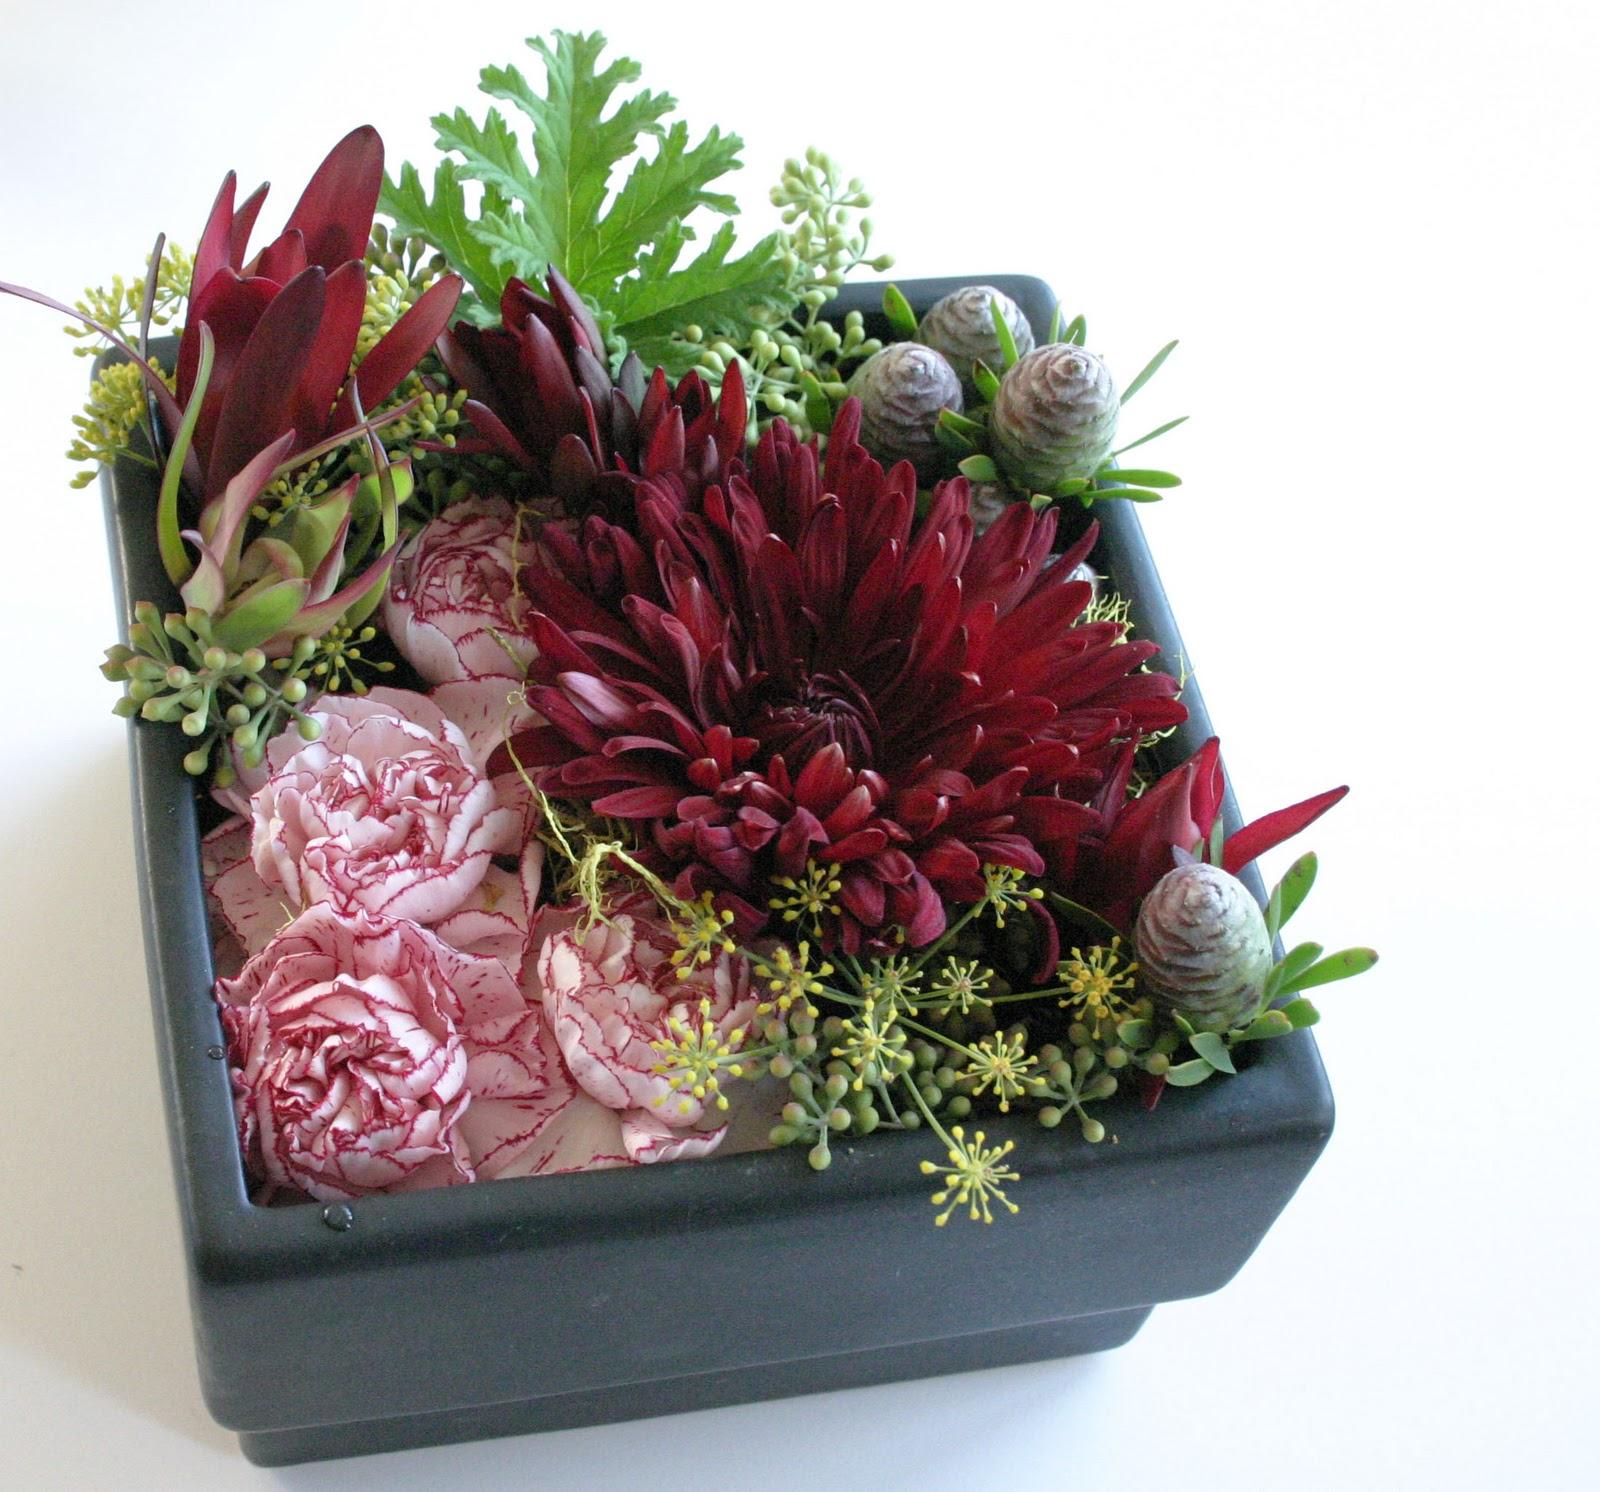 flower floral pave arrangements designs flowers investigating carpets nardo petals contemporary paves blogthis email